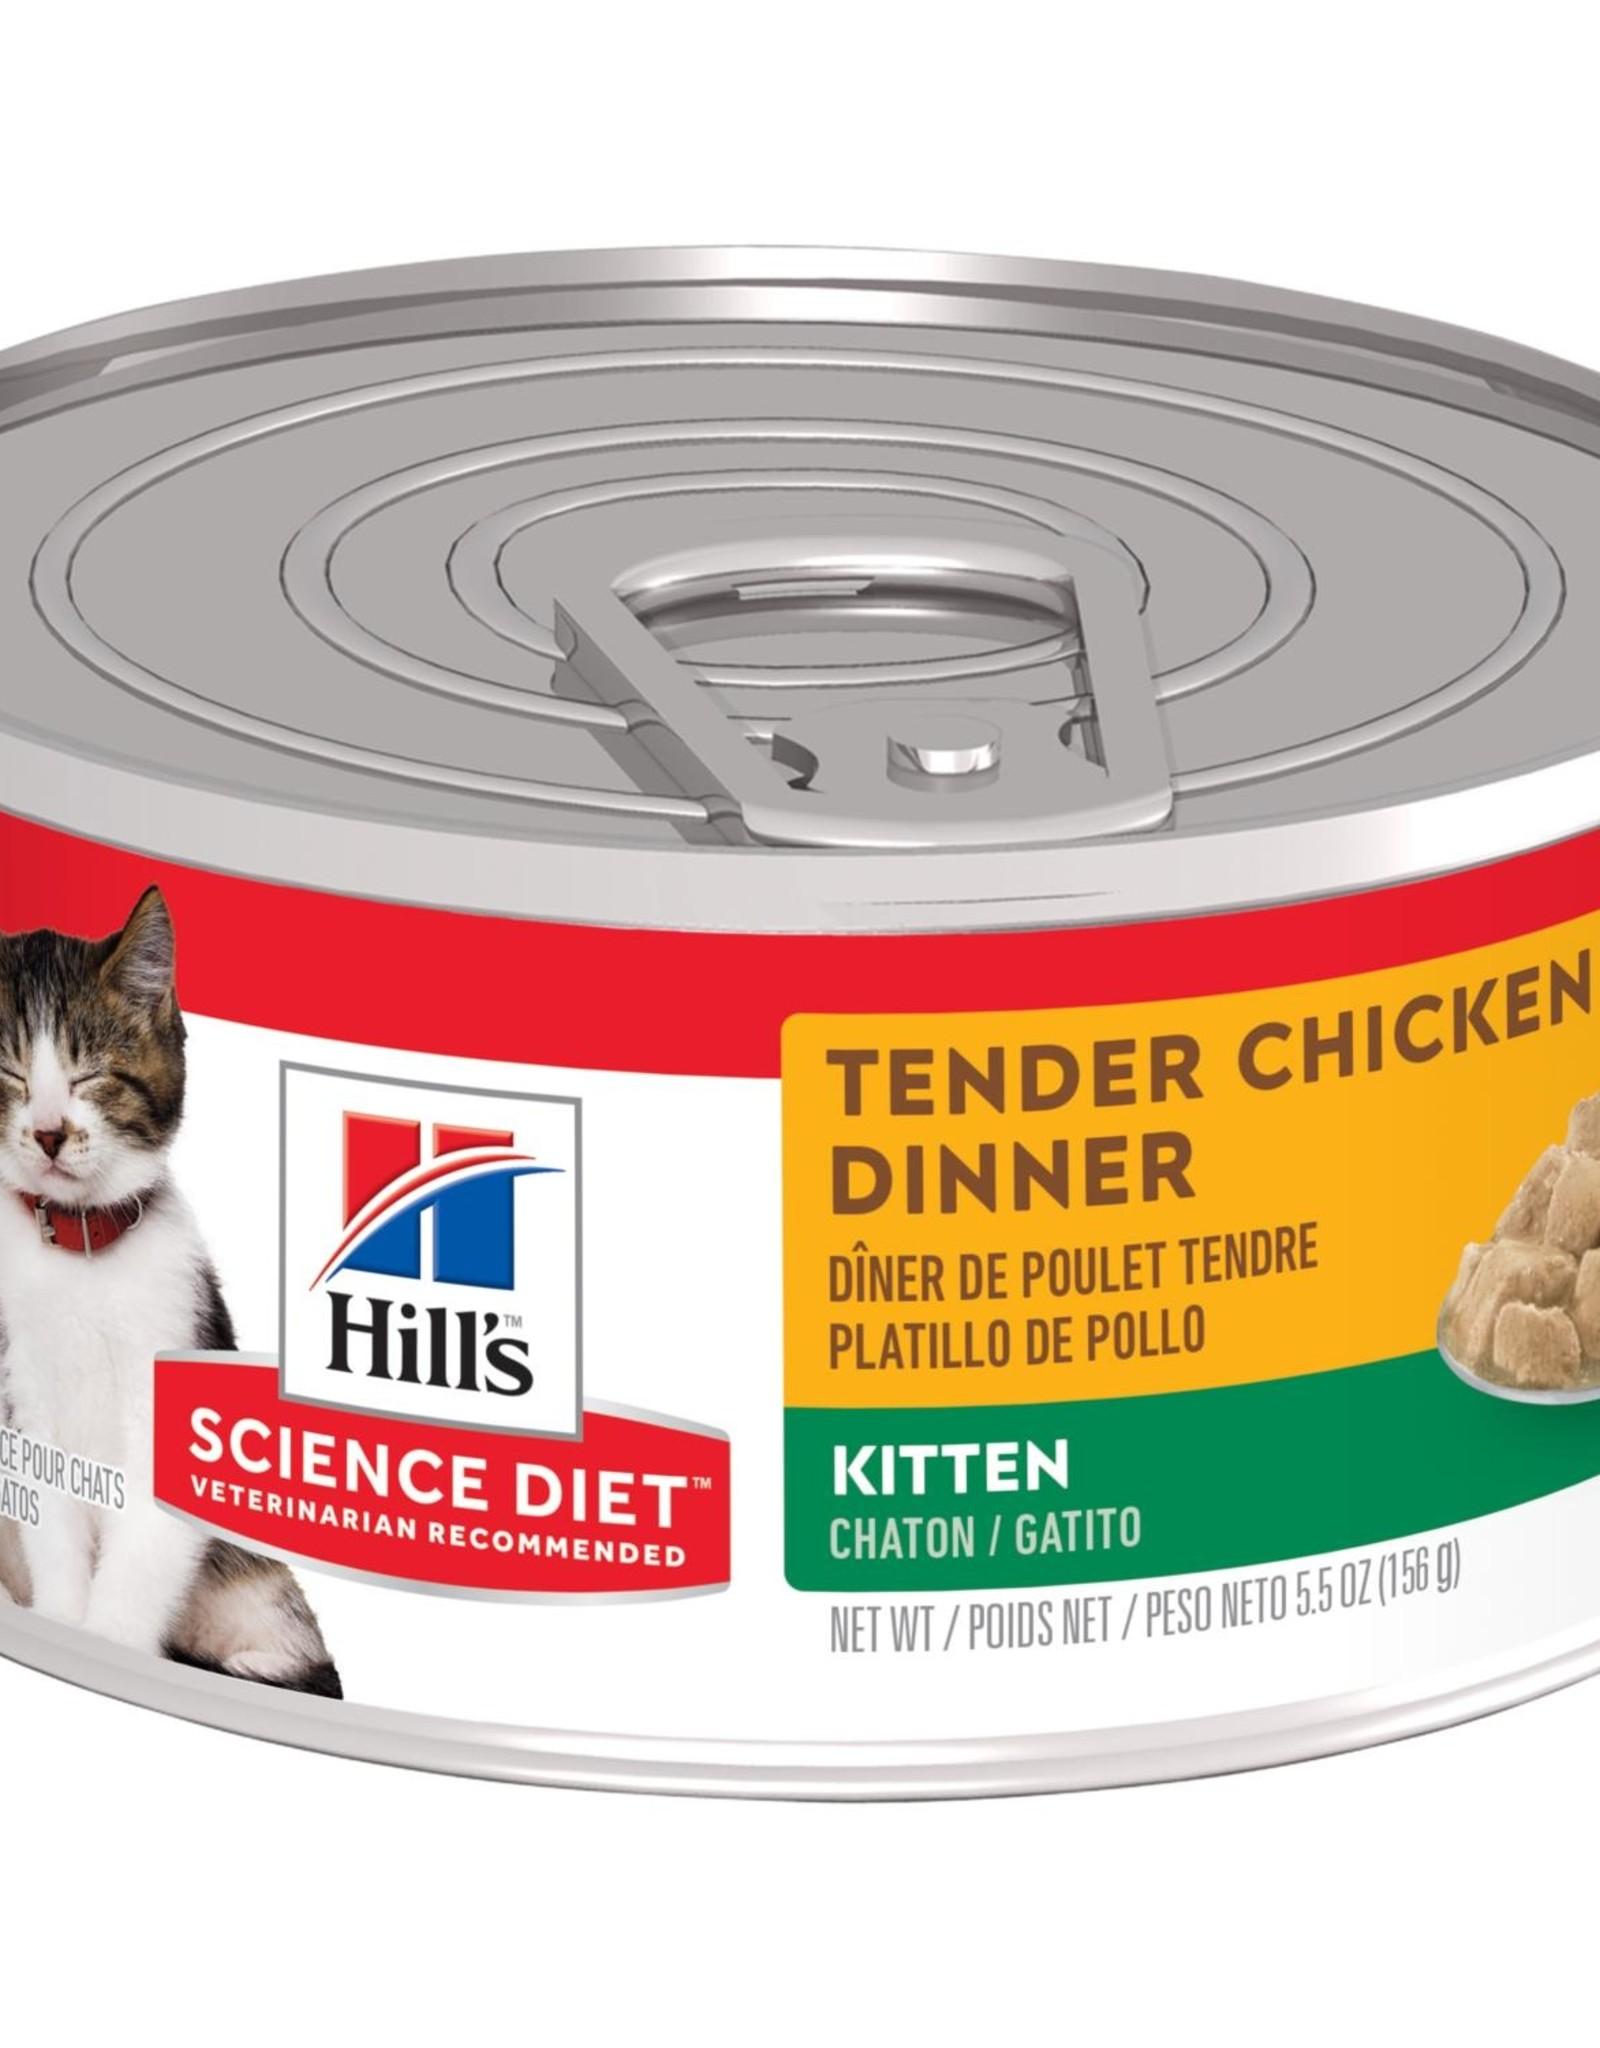 SCIENCE DIET HILL'S SCIENCE DIET FELINE CAN KITTEN TENDER CHICKEN DINNER 5.5OZ